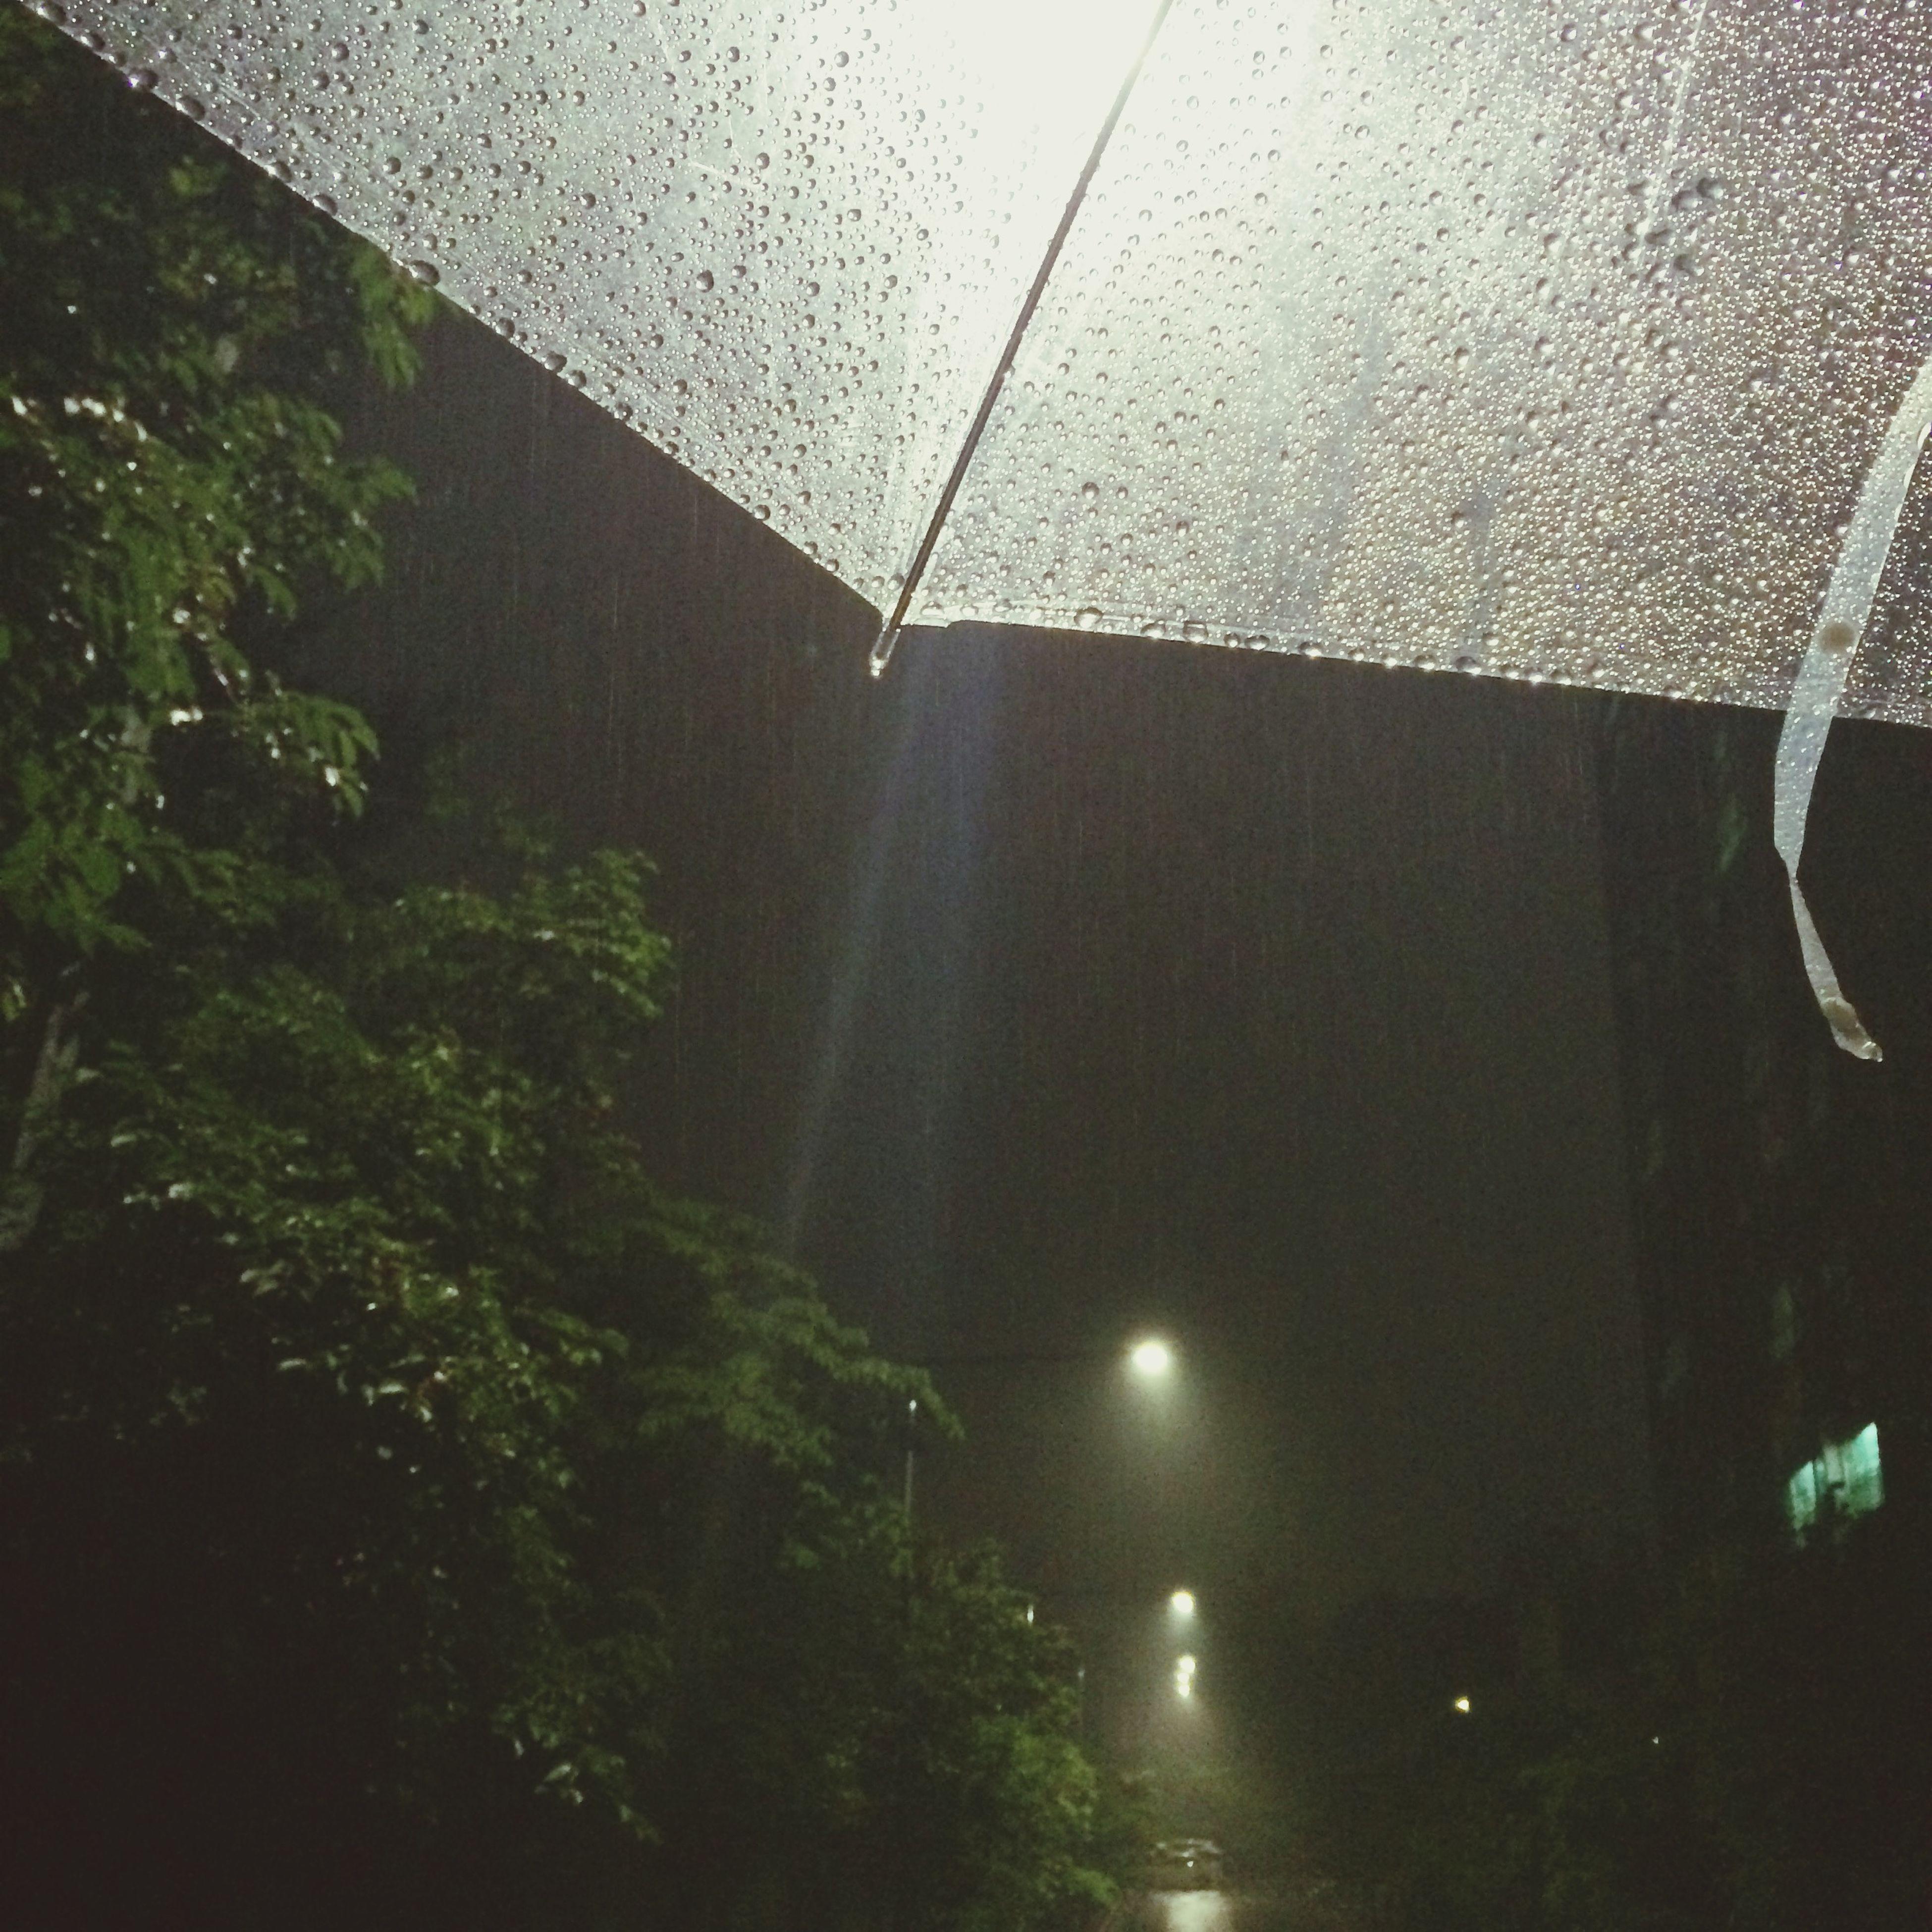 rain, wet, window, glass - material, transparent, drop, water, indoors, raindrop, weather, street, transportation, glass, tree, car, reflection, no people, monsoon, season, road